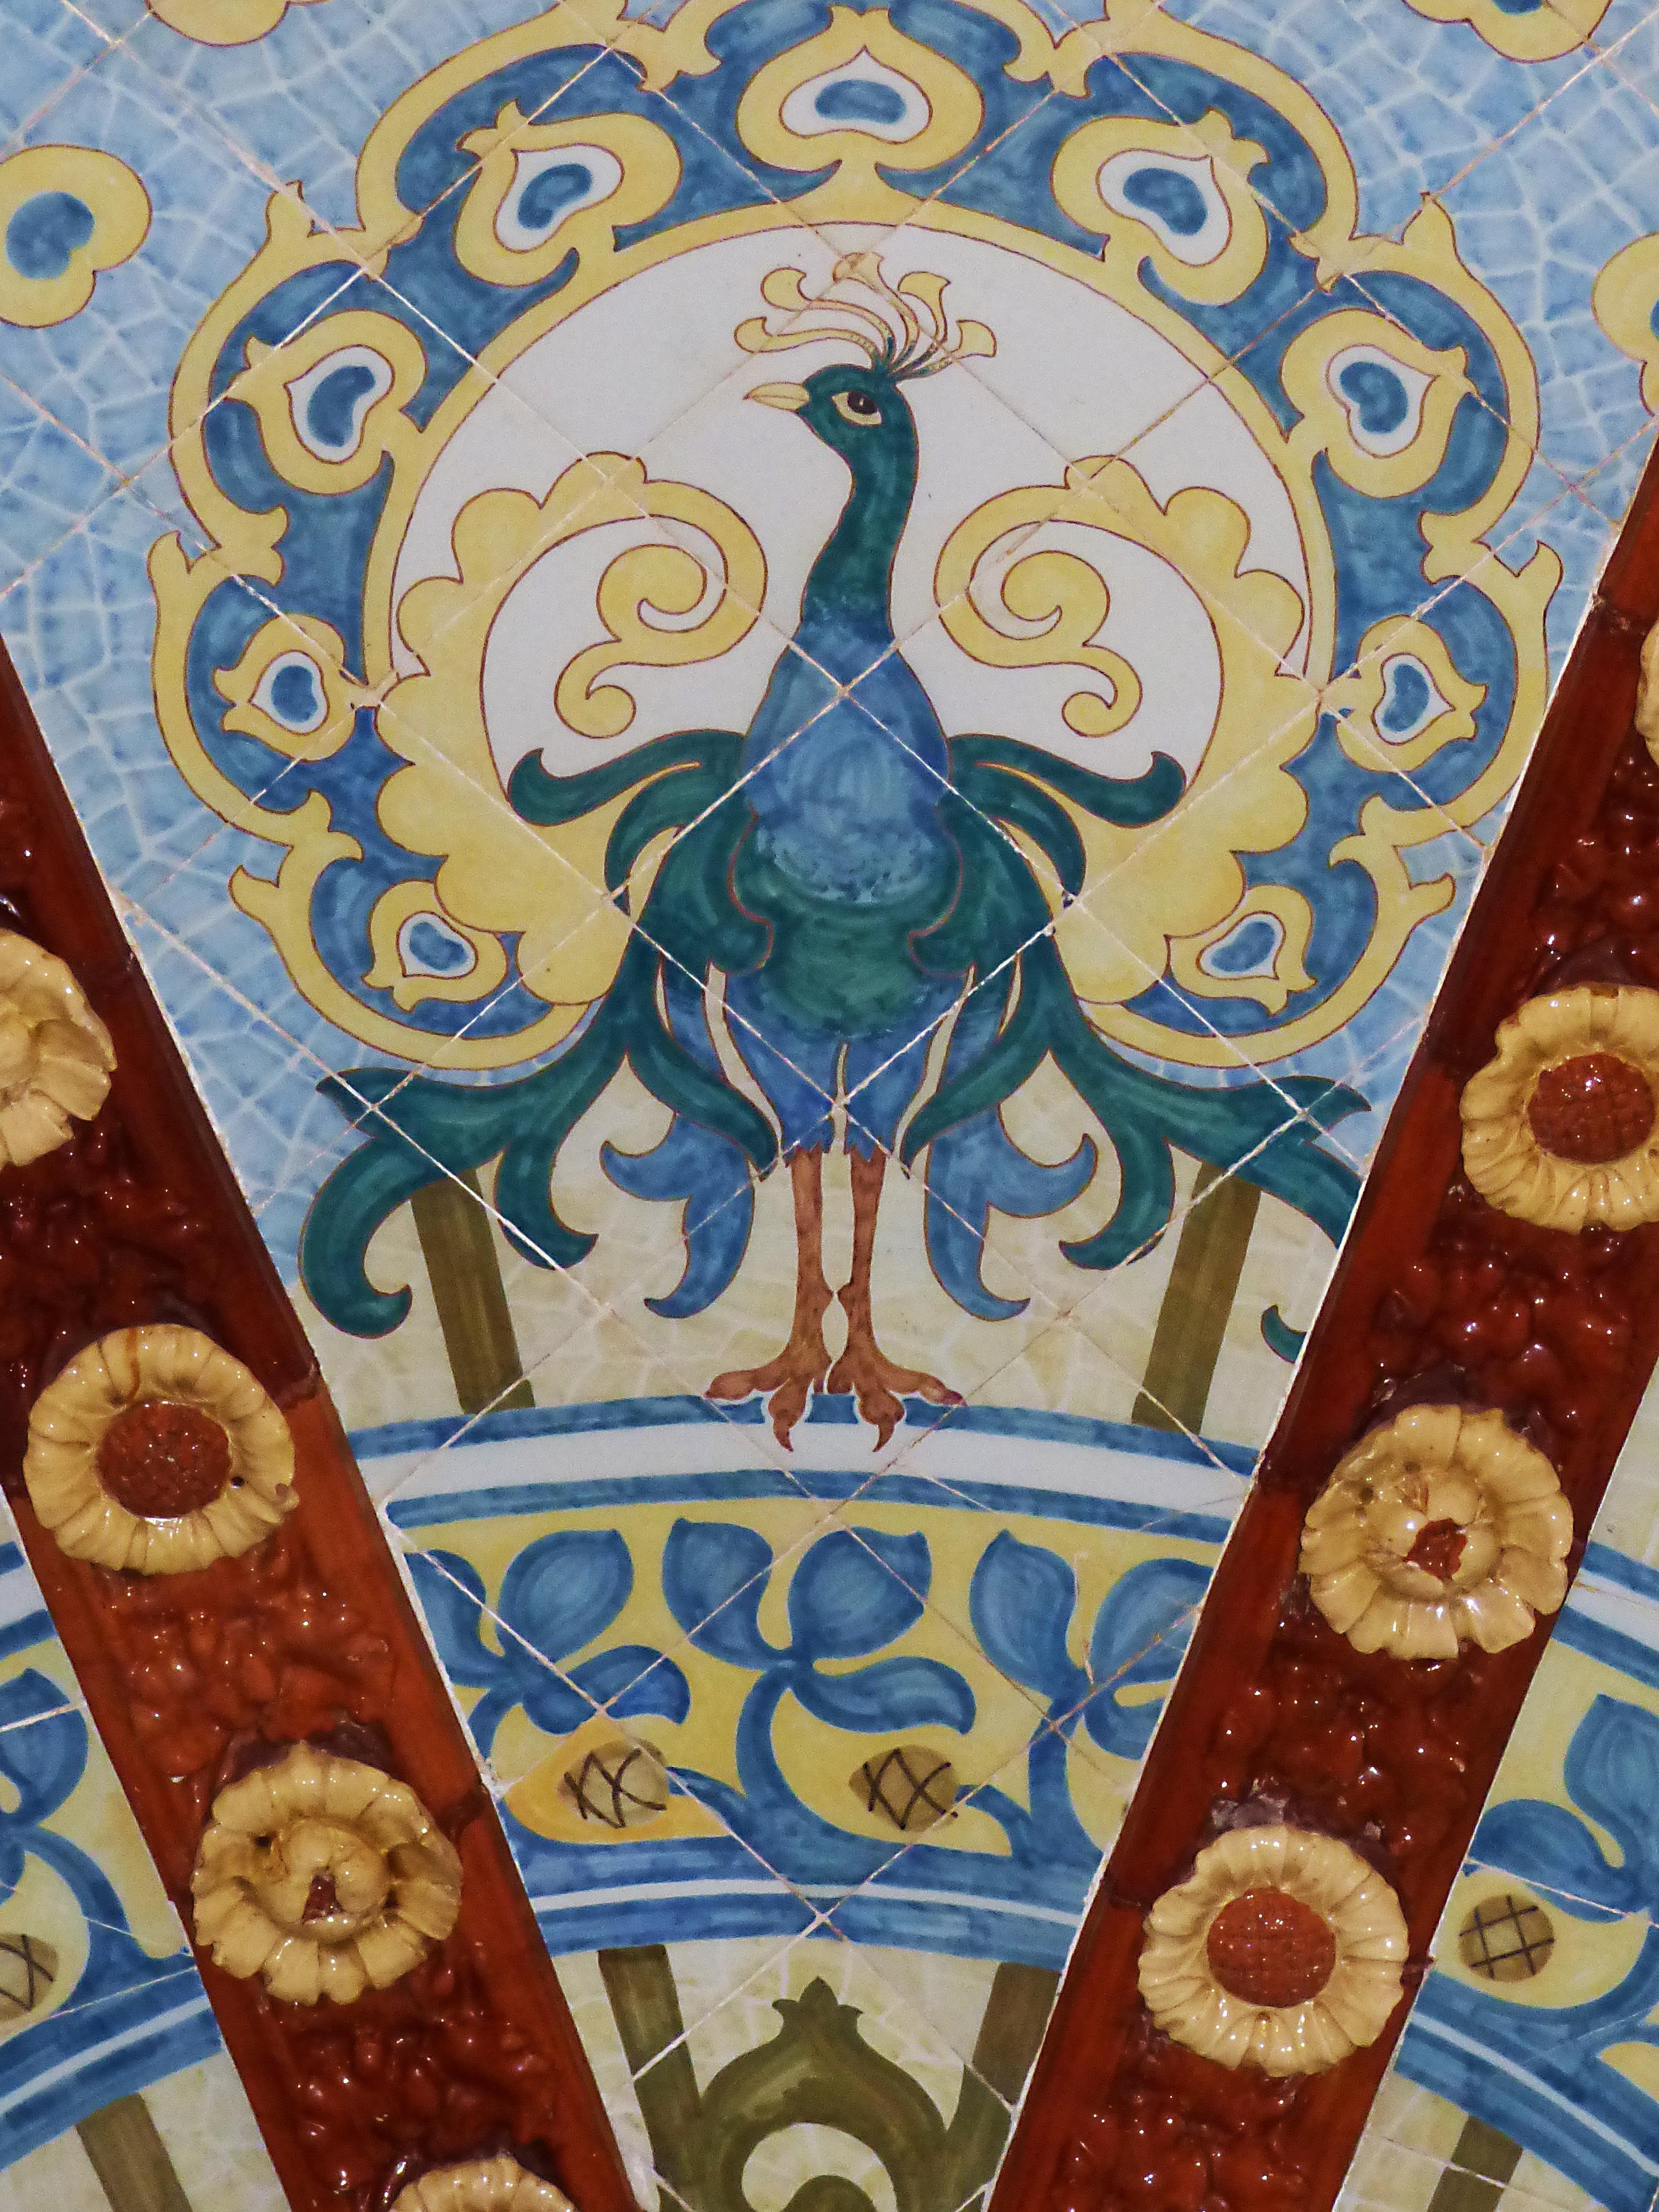 Free images tiles ceramic crafts catalan modernism reus tiles ceramic crafts catalan modernism reus pere mata art noveau monogram dailygadgetfo Images